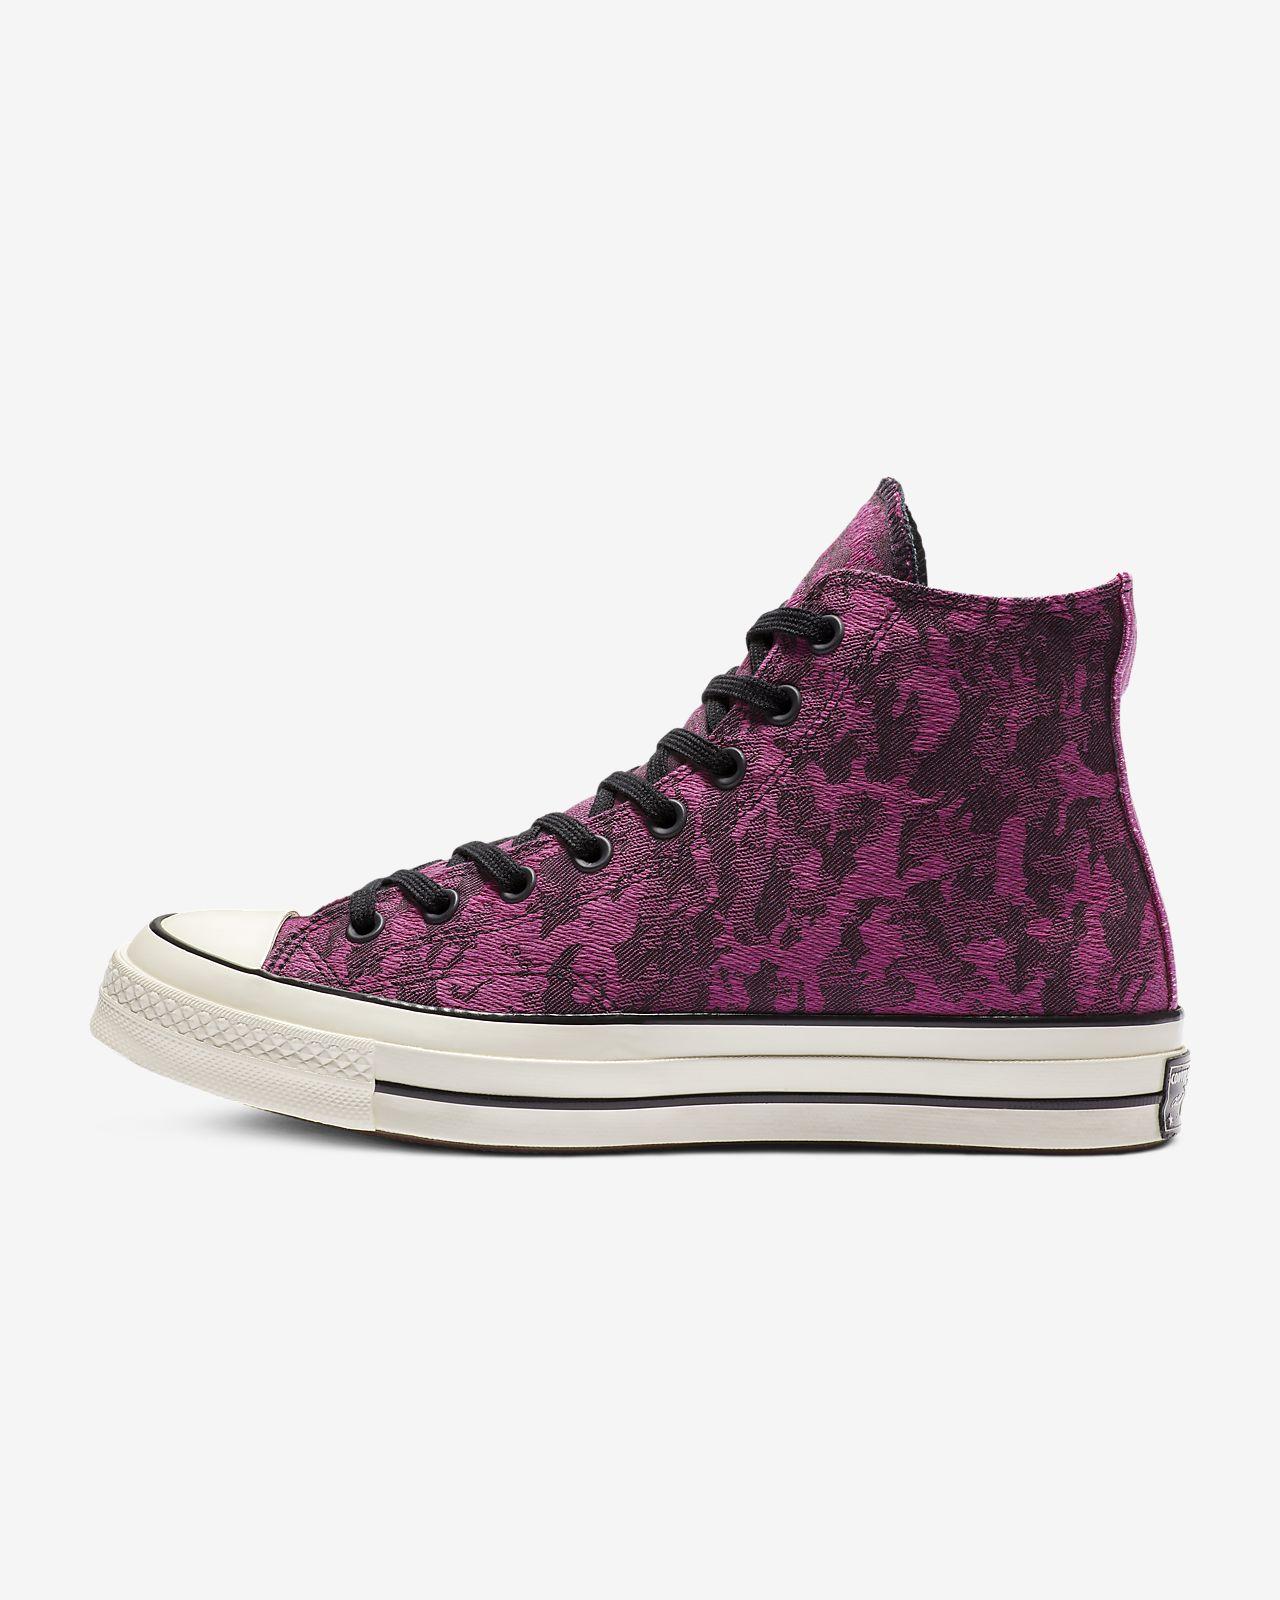 Converse Chuck 70 Denim Camo High Top Unisex Shoe